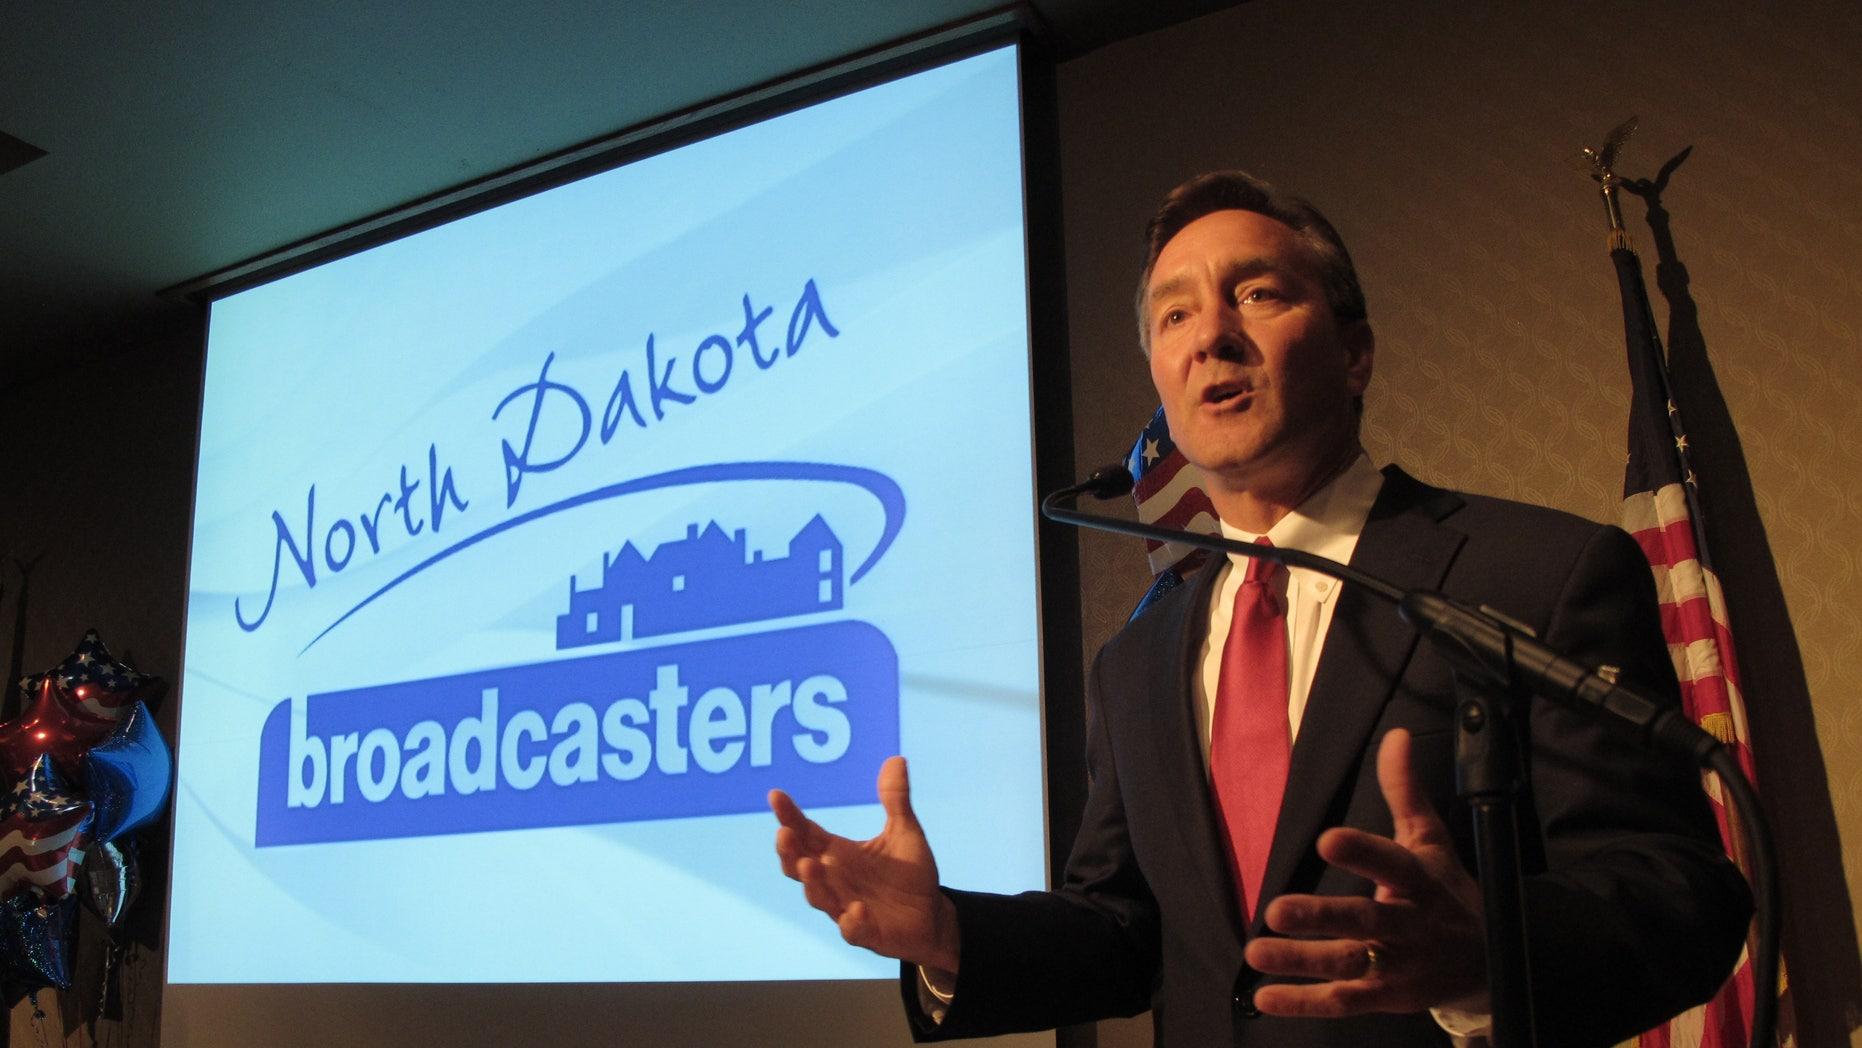 FILE: Sept. 5, 2012: Republican U.S. Senate candidate Rick Berg speaks during a debate at the Radisson Hotel in Bismarck, N.D.